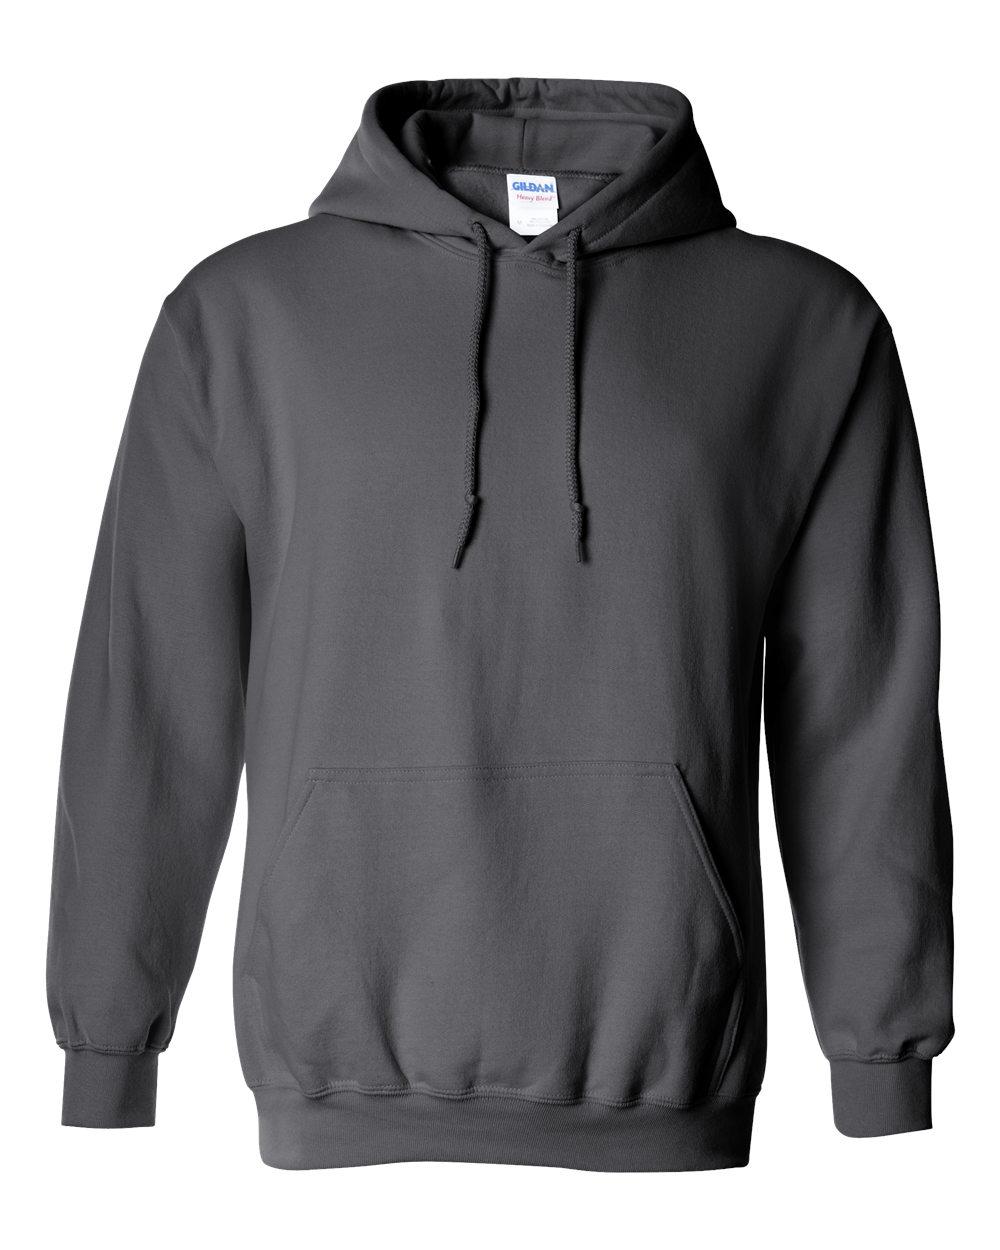 Gildan-Mens-Blank-Hoodie-Heavy-Blend-Hooded-Sweatshirt-Solid-18500-up-to-5XL thumbnail 18